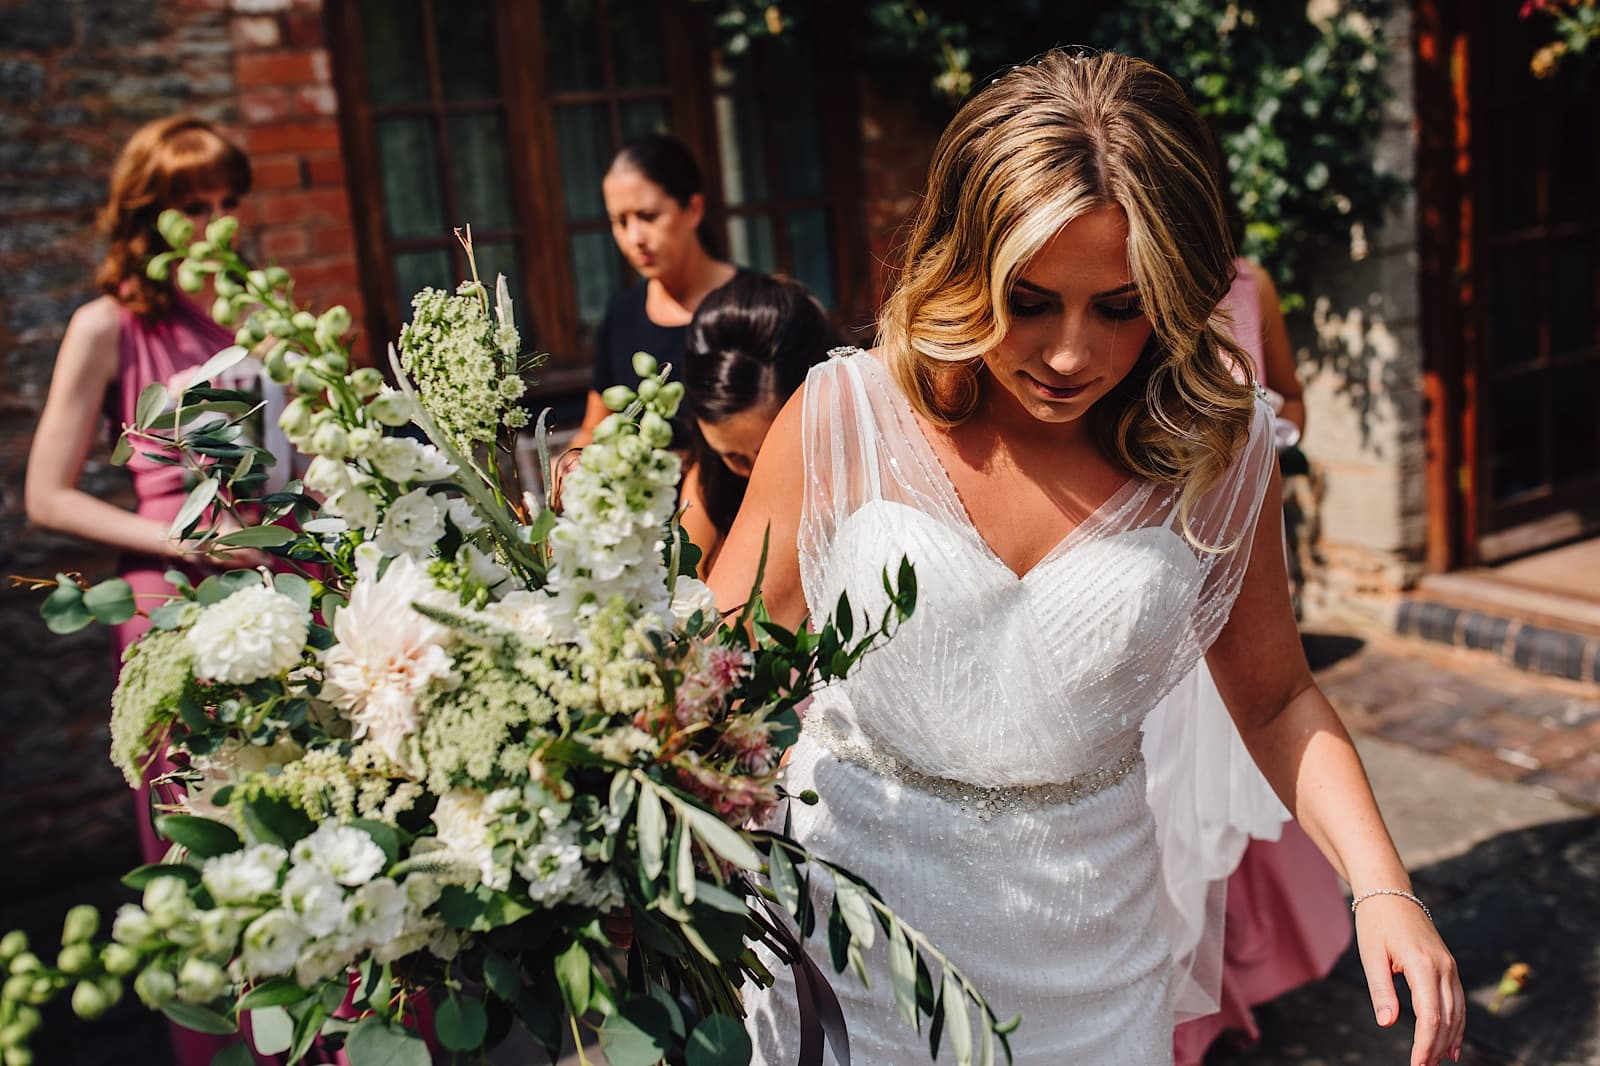 birtsmorton court wedding photography 0016